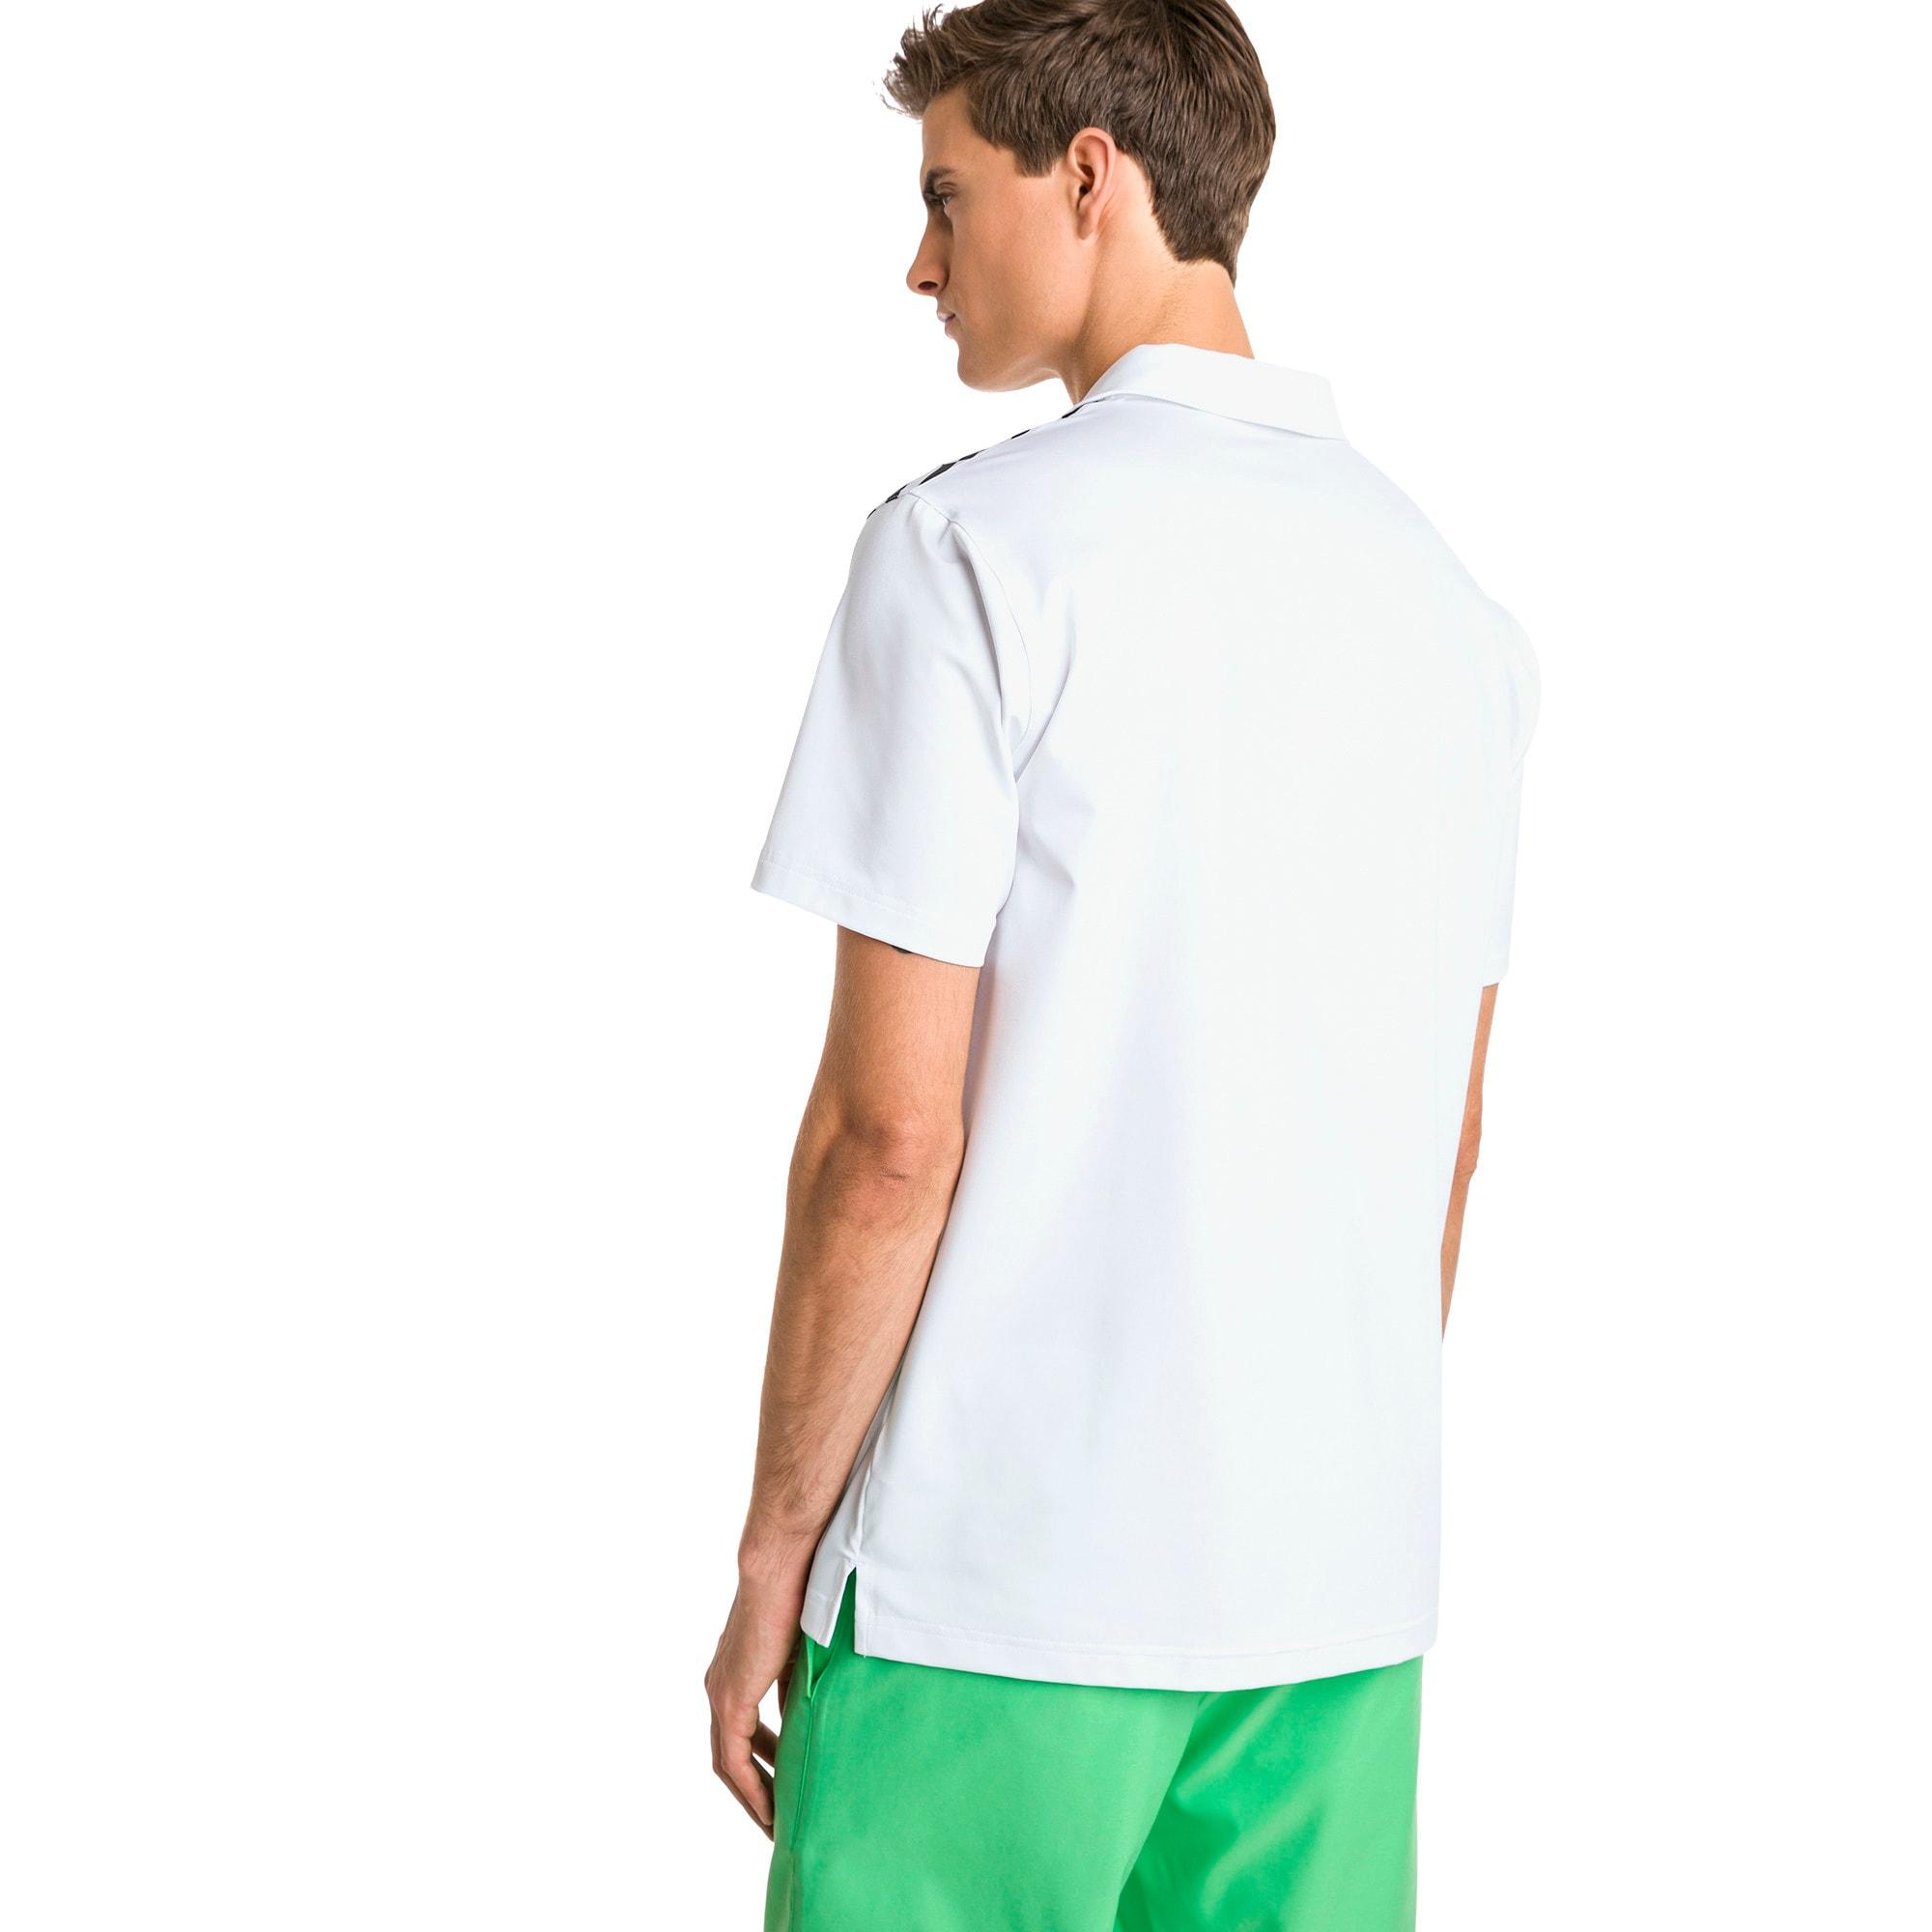 Thumbnail 2 of Road Map Men's Golf Polo, Bright White-Irish Green, medium